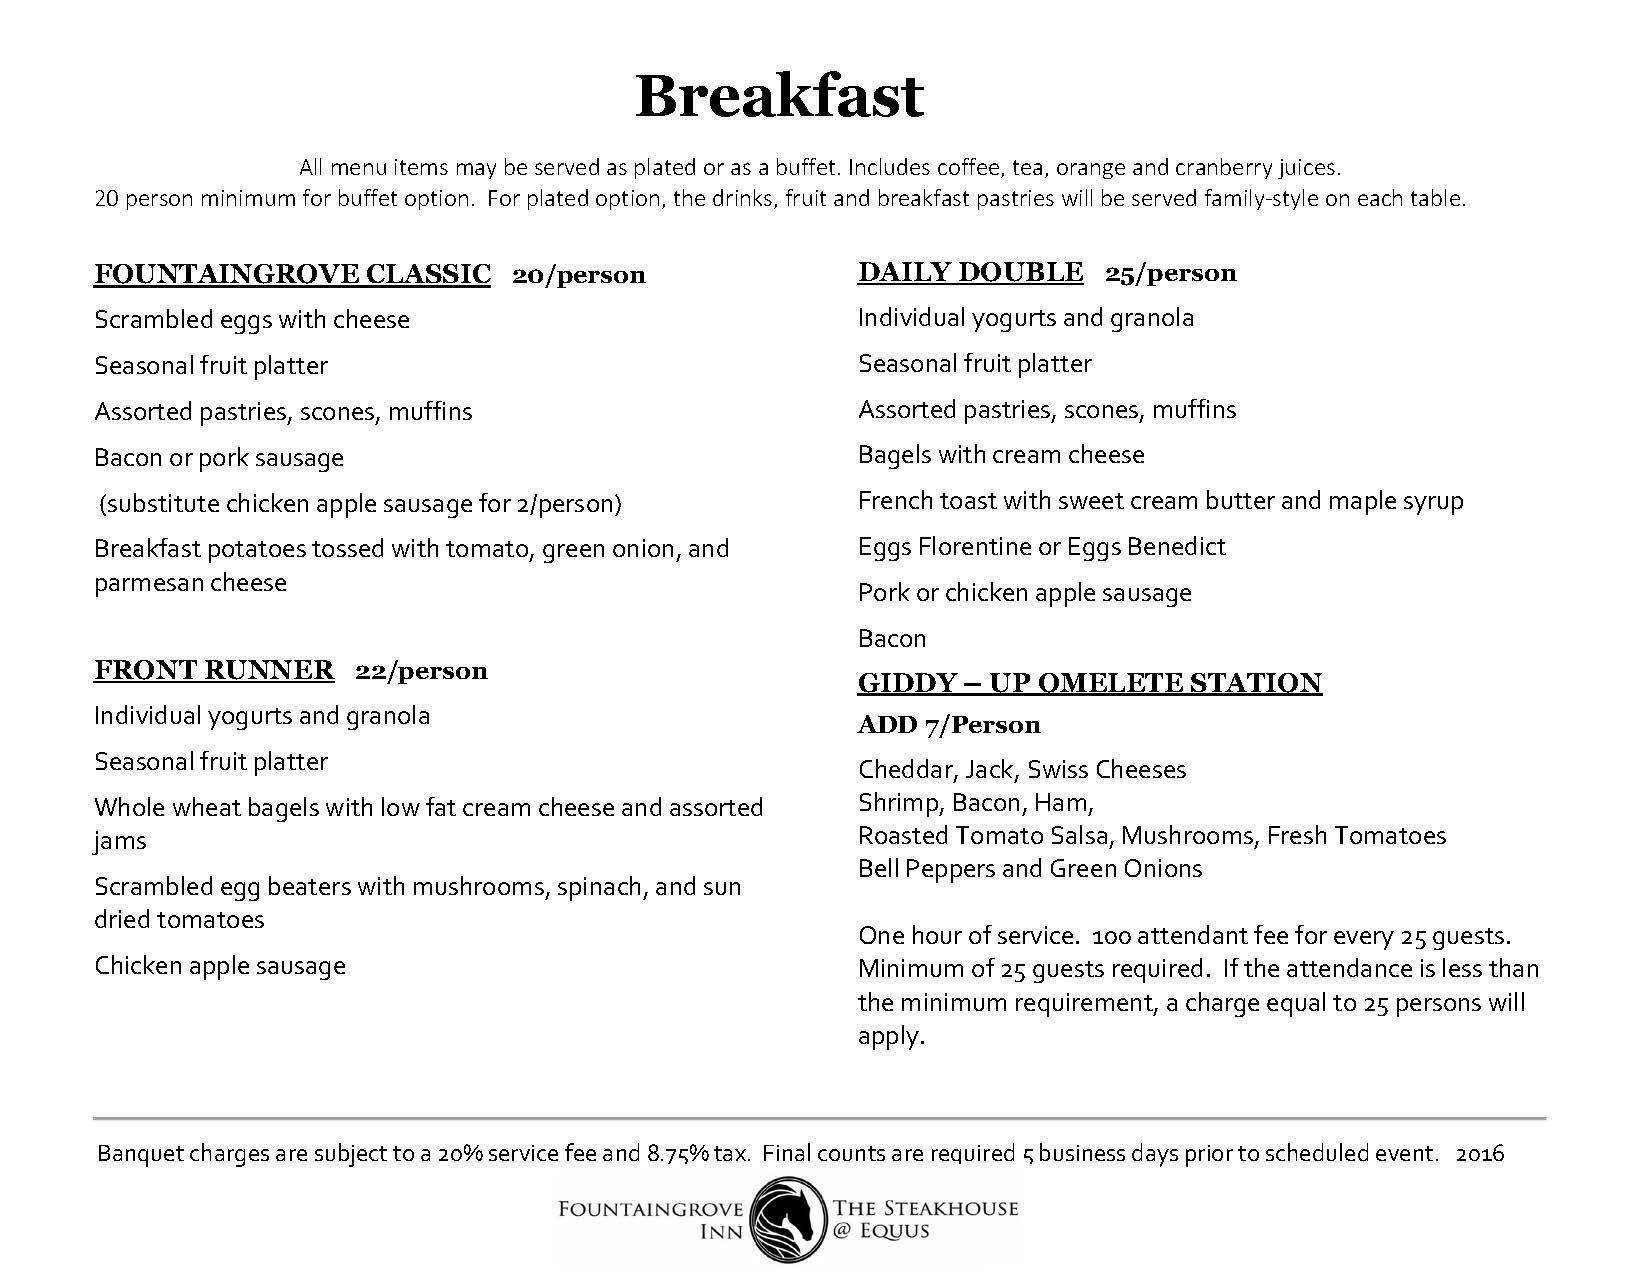 Banquet_Breakfast Menu 2016_upd 8.29.16.jpg